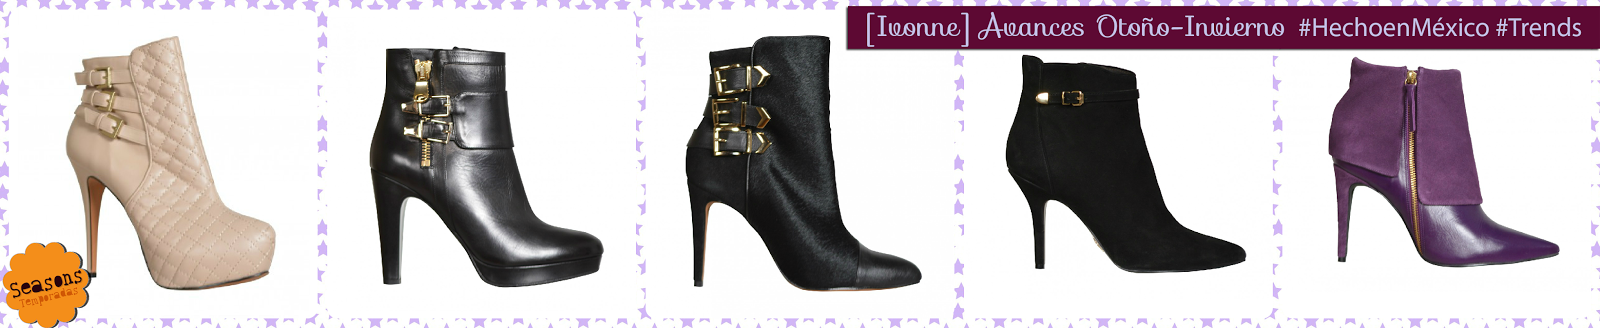 [Hecho en México] Ivonne: Calzado otoño-invierno /Shoes AW14  L-vi.com